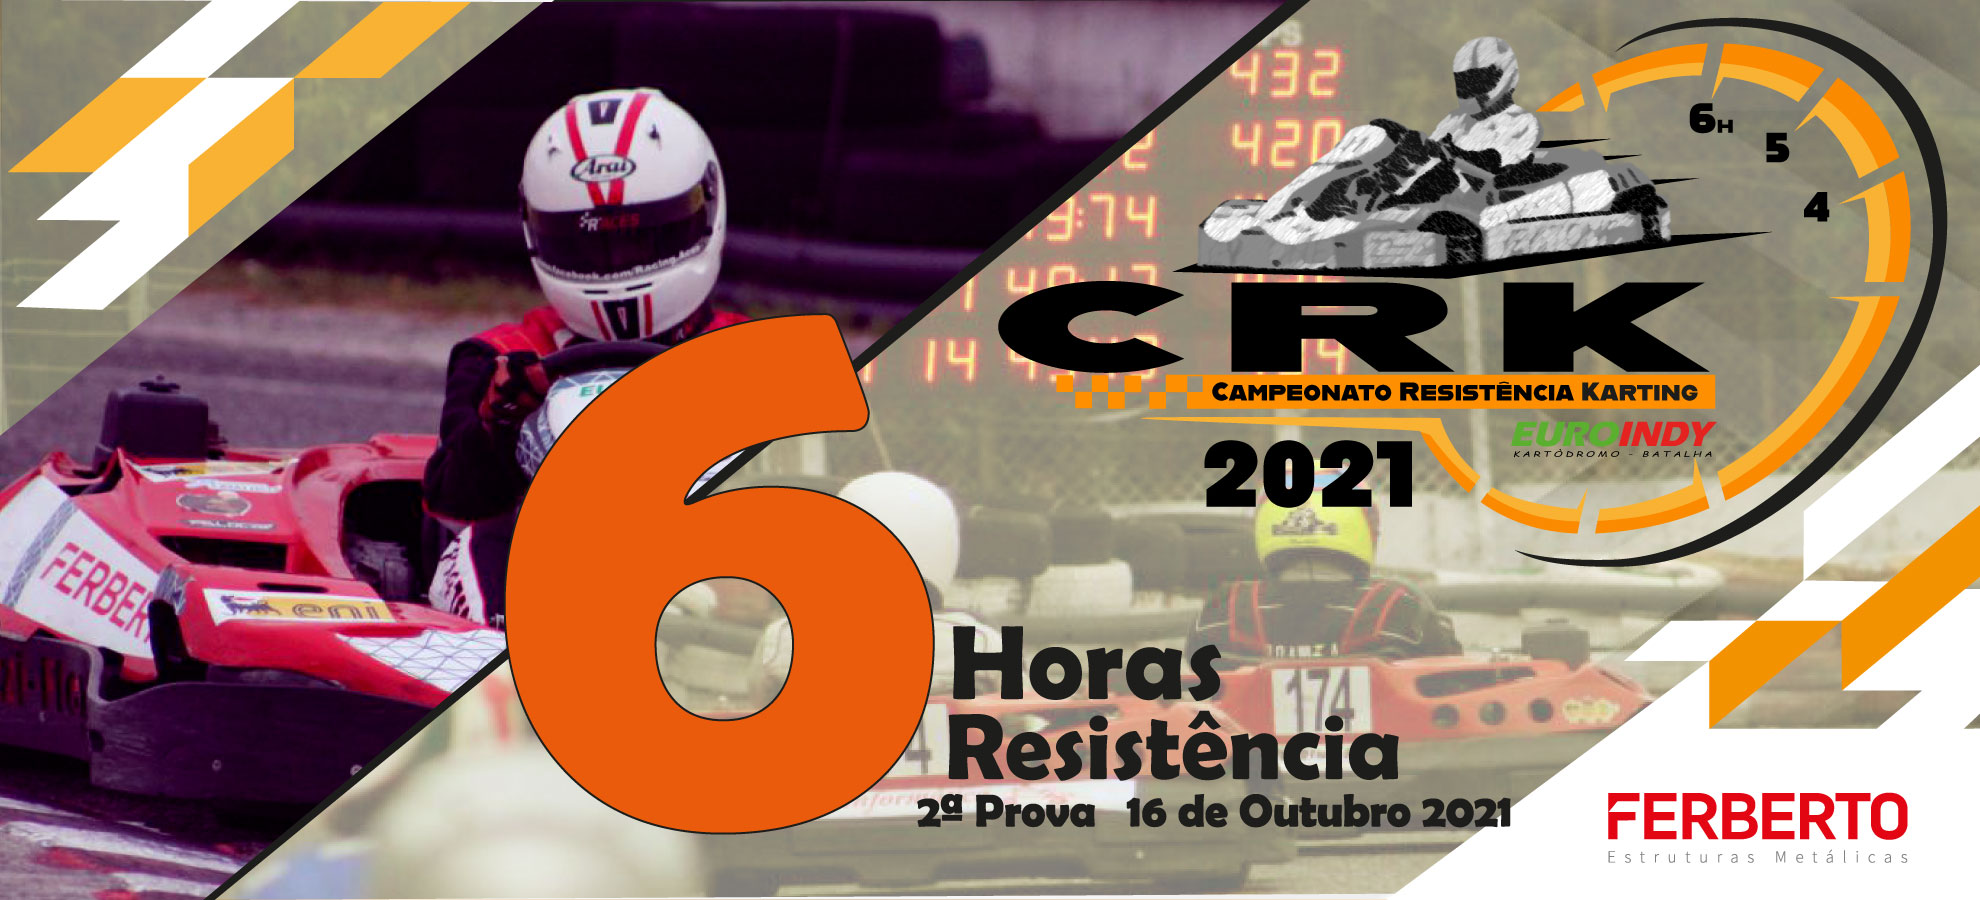 2º Prova - Campeonato Resistência Karting 2021